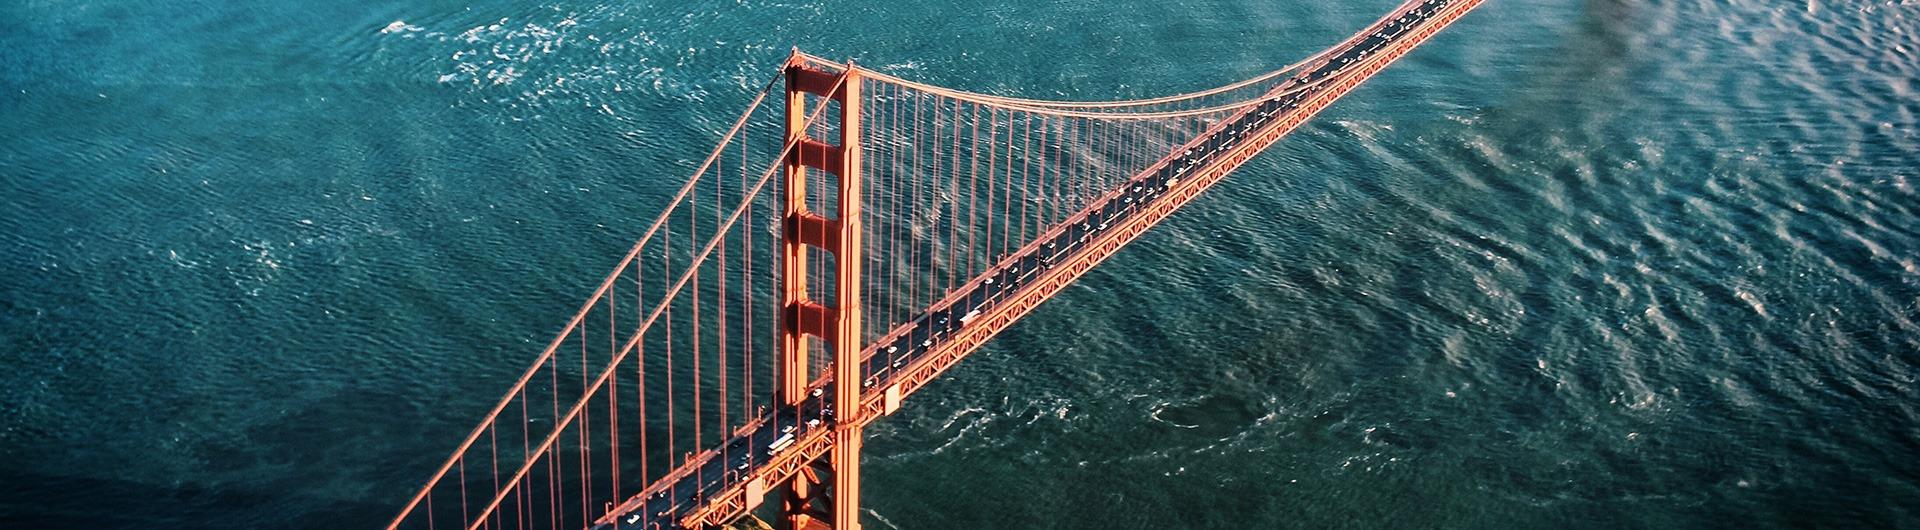 Aerial of the Golden Gate Bridge in San Francisco, California